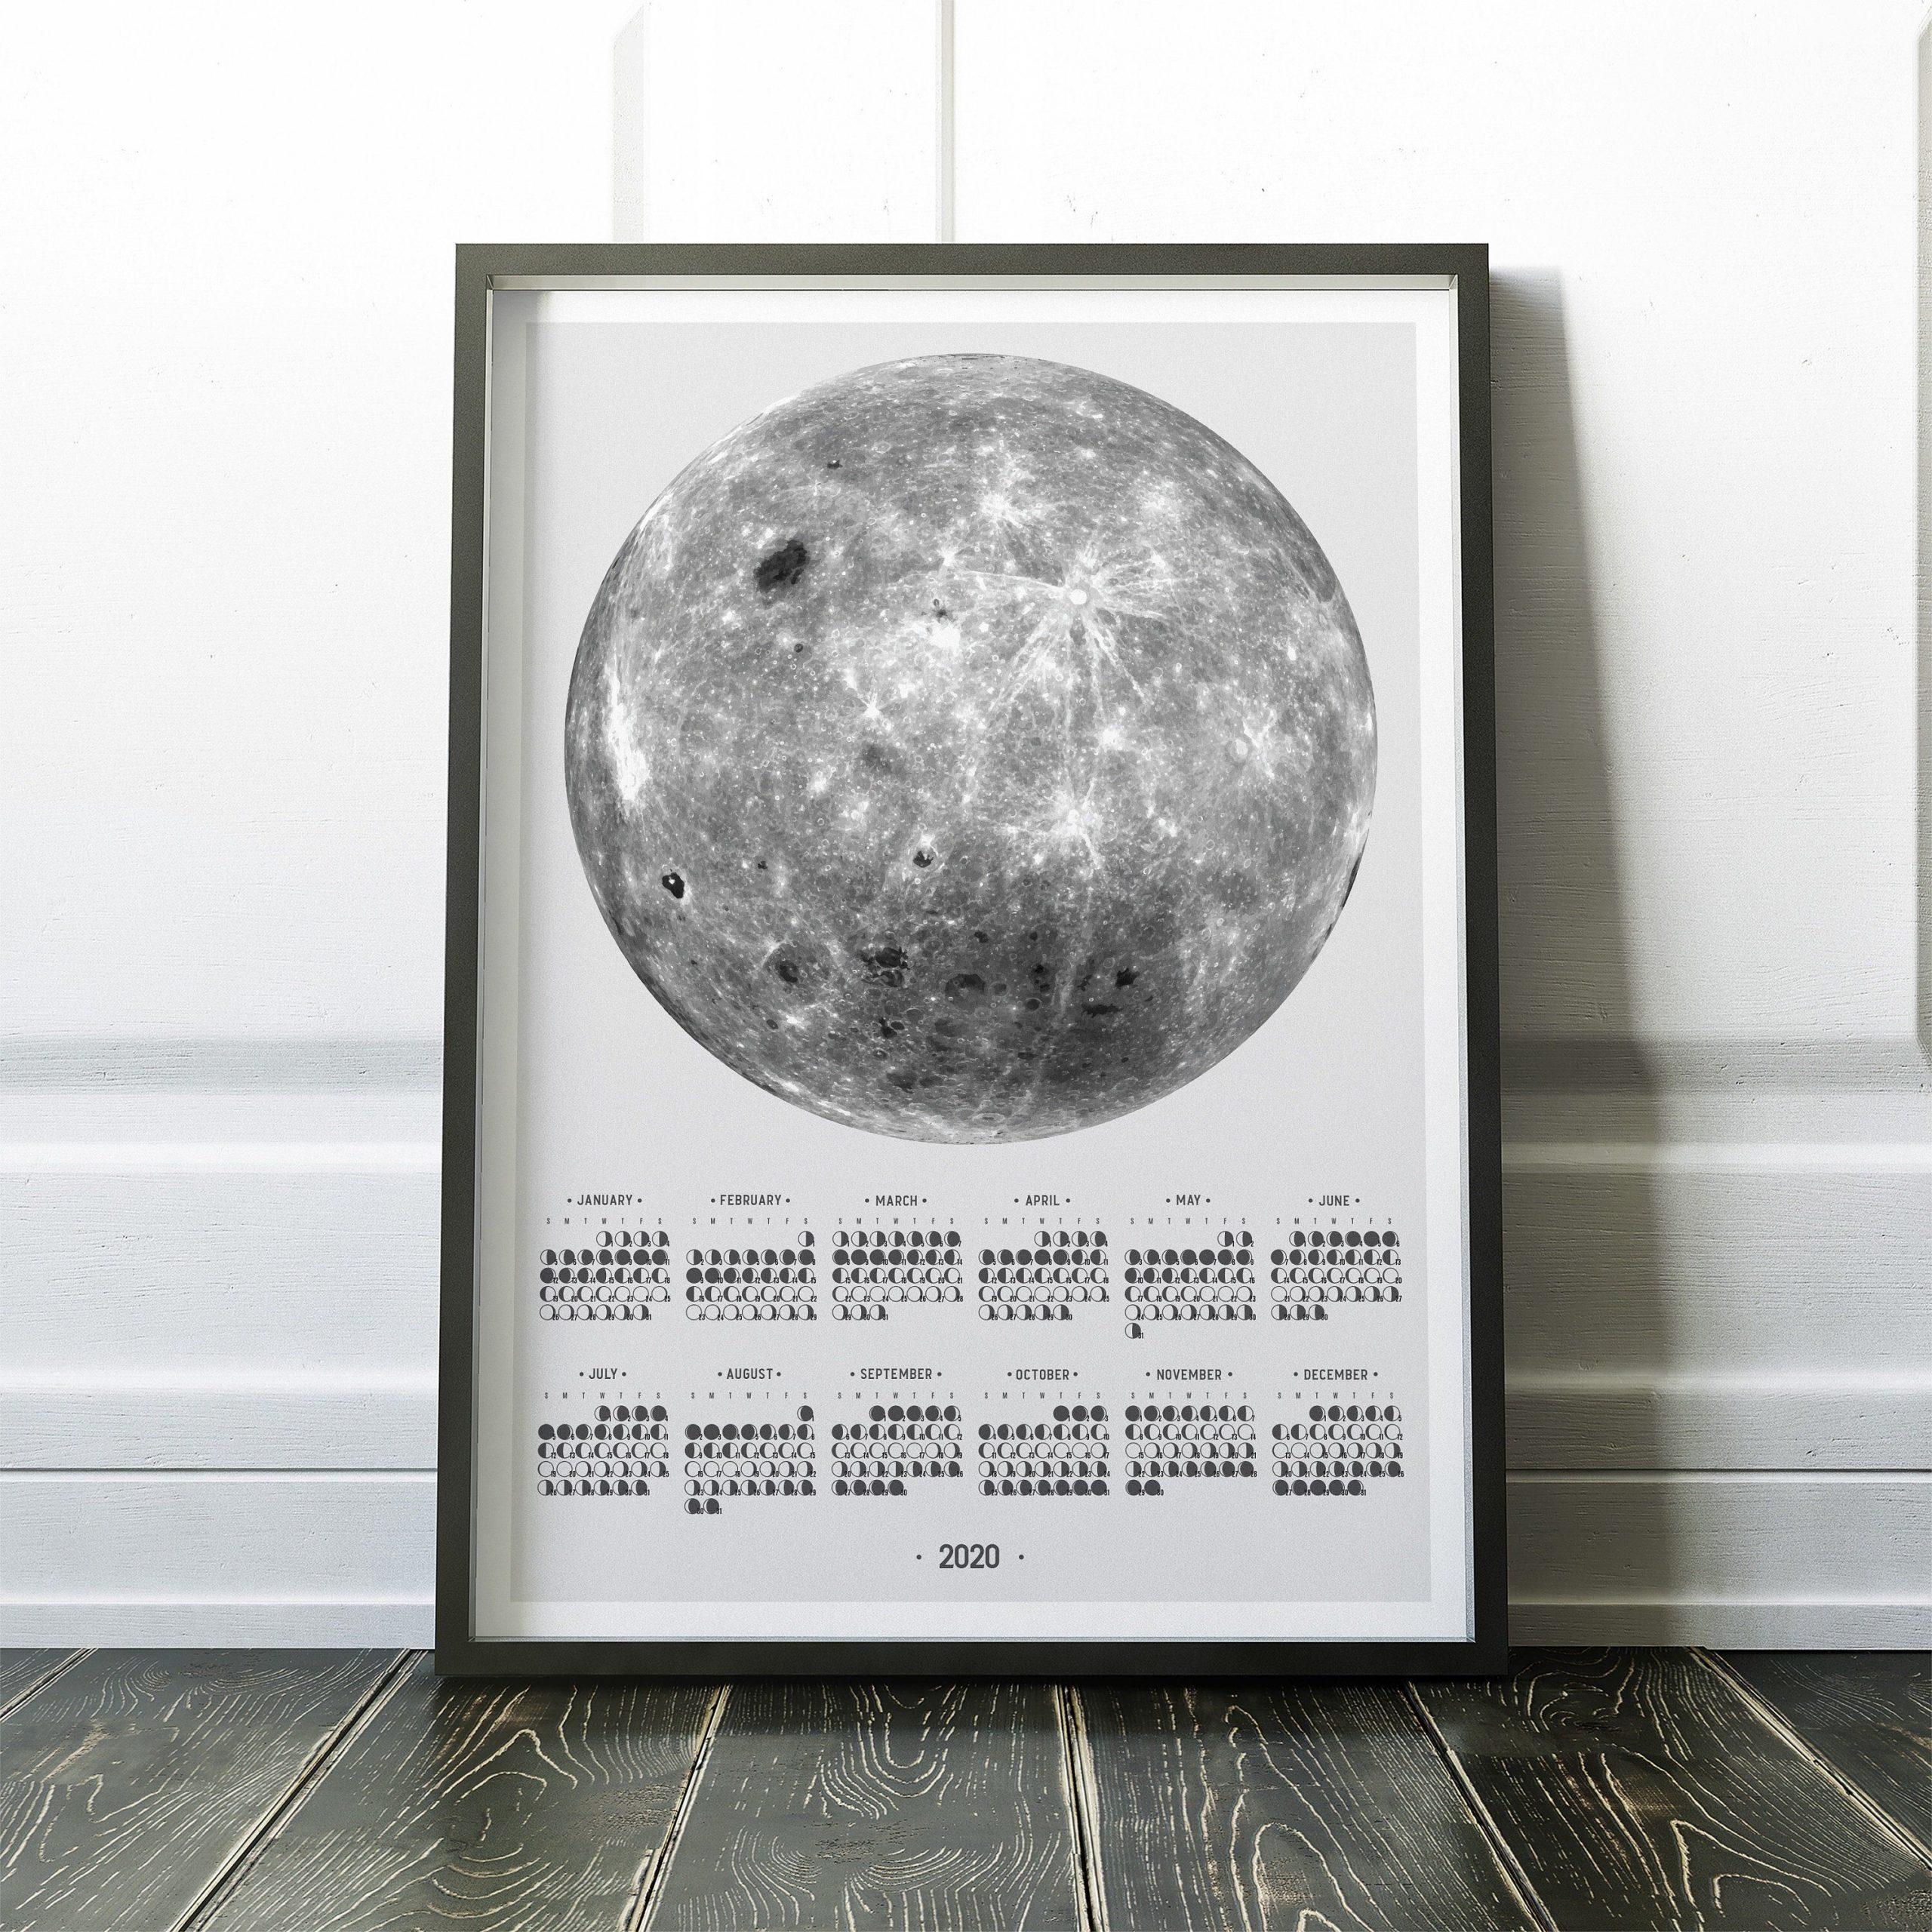 2020 At A Glance Wall Calendar, Full Size Moon Calendar With